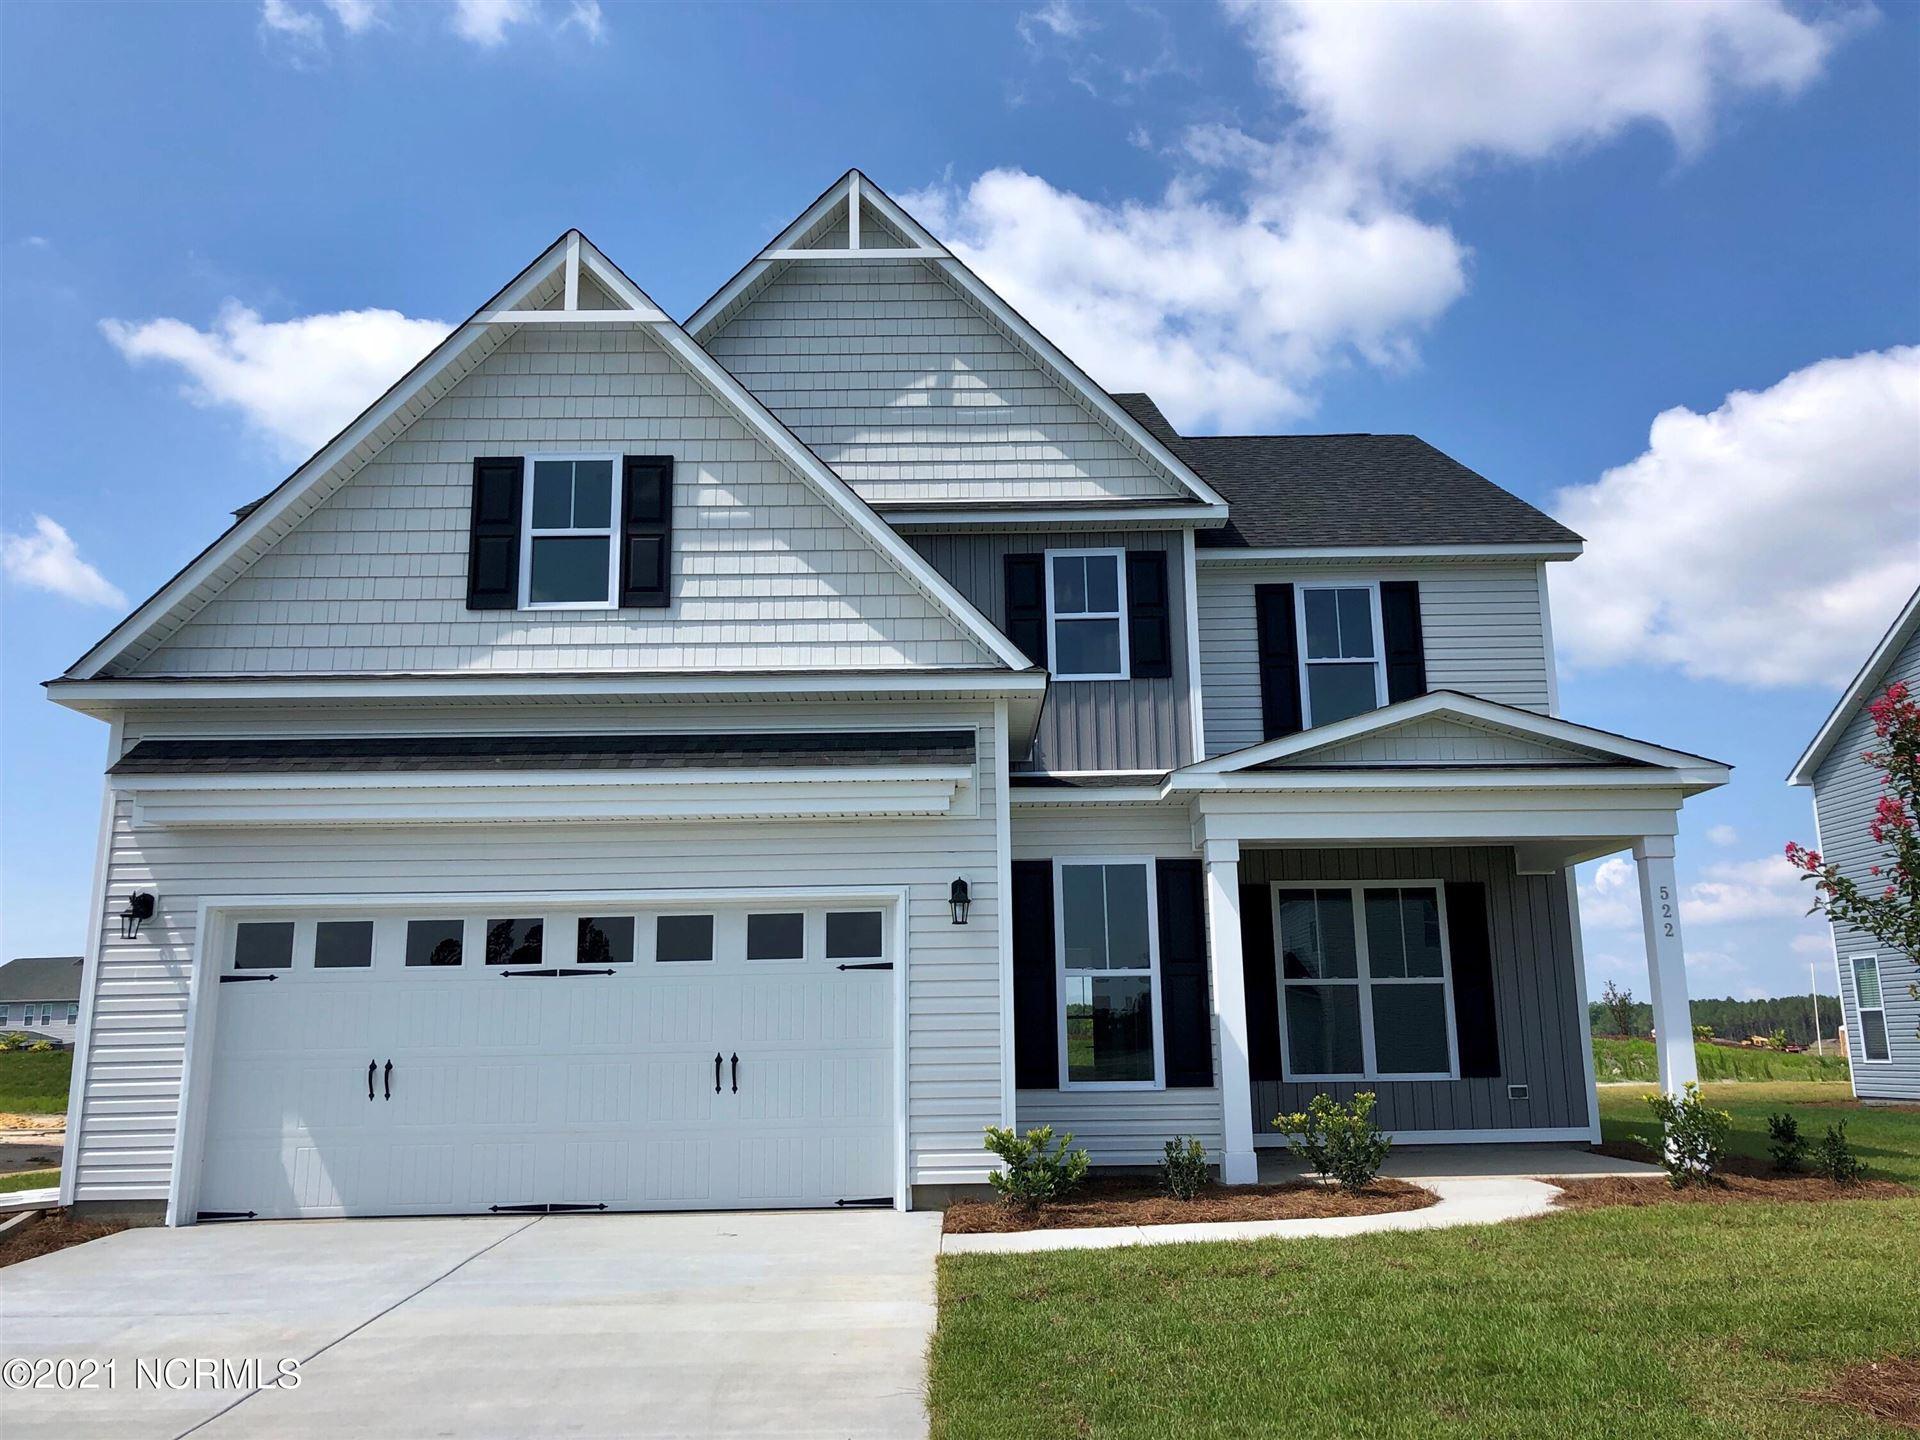 Photo of 345 Grandview Drive, Hampstead, NC 28443 (MLS # 100289188)